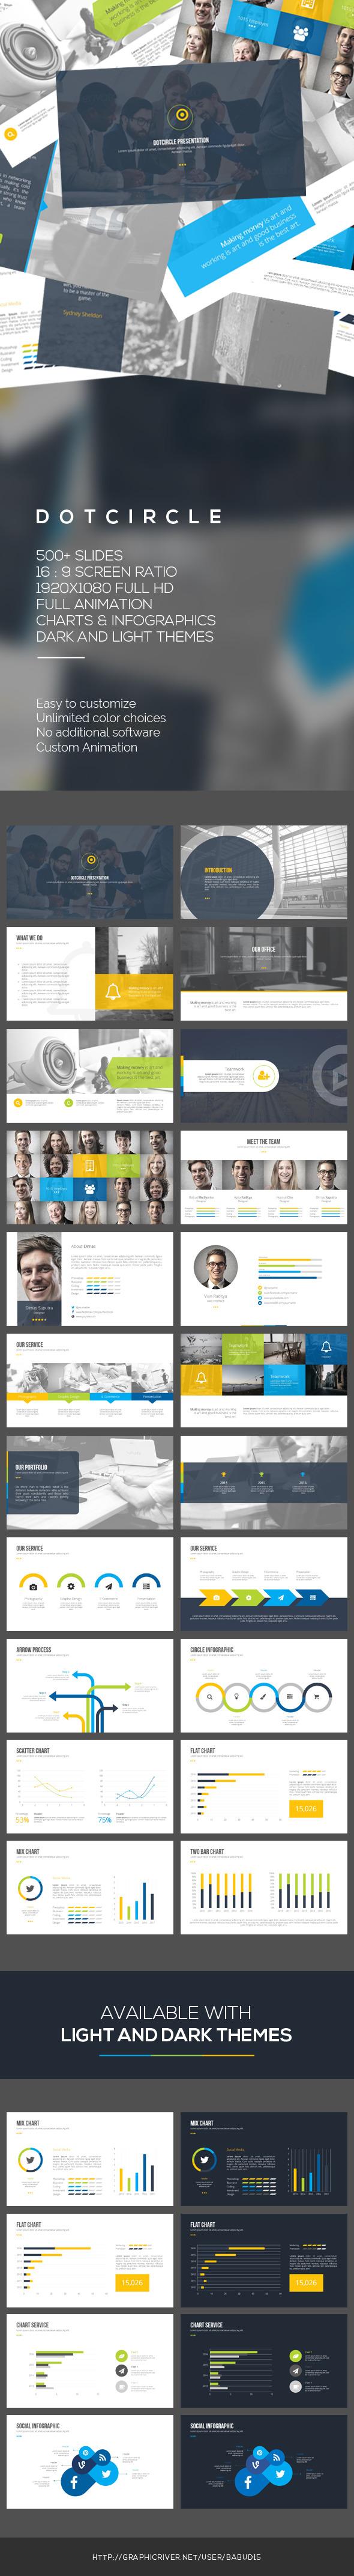 Dotcircle PowerPoint Template - PowerPoint Templates Presentation Templates